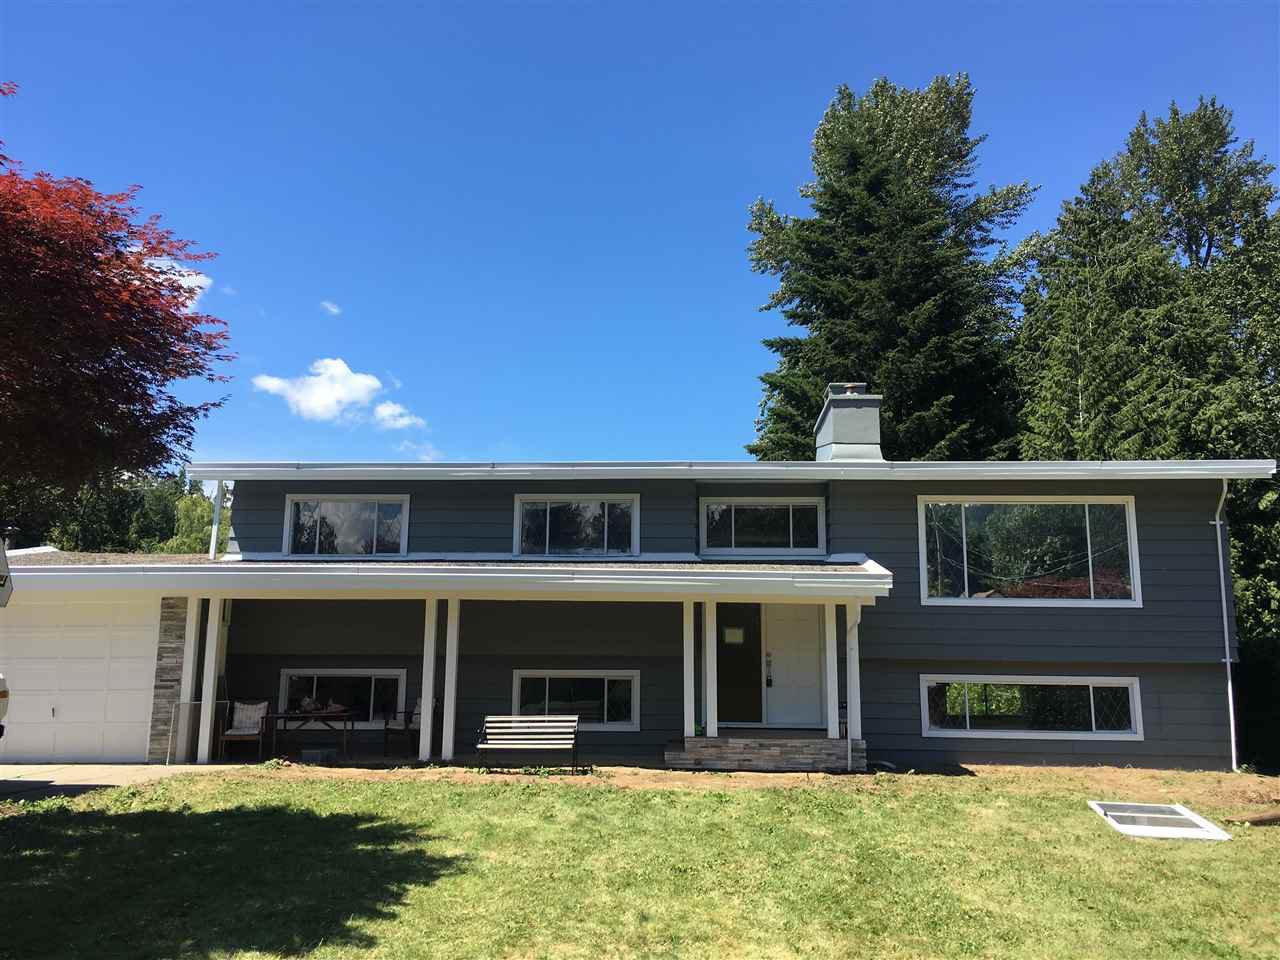 Main Photo: 489 NAISMITH Avenue: Harrison Hot Springs House for sale : MLS®# R2327233